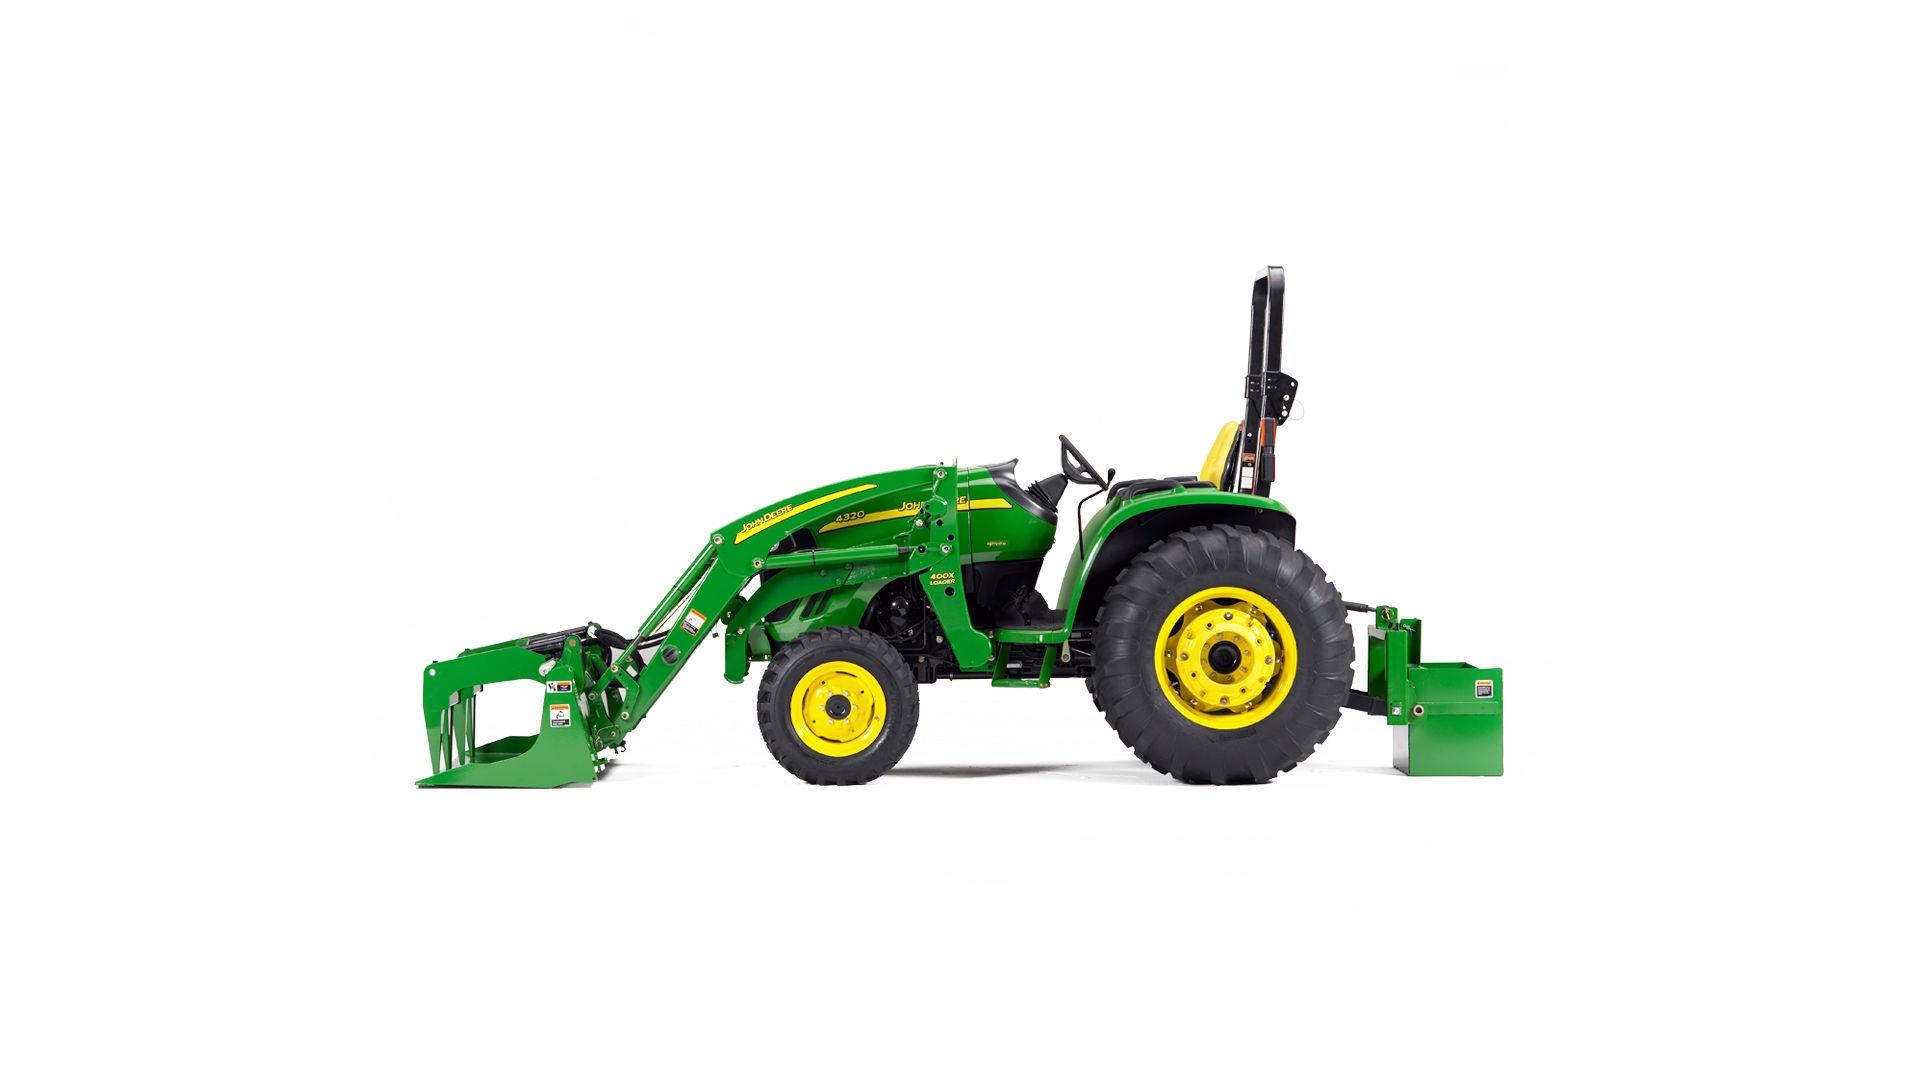 https://assets.sourcemedia.com/e7/06/f5ab2419472dbe3abc185d2bf294/tractor.jpg